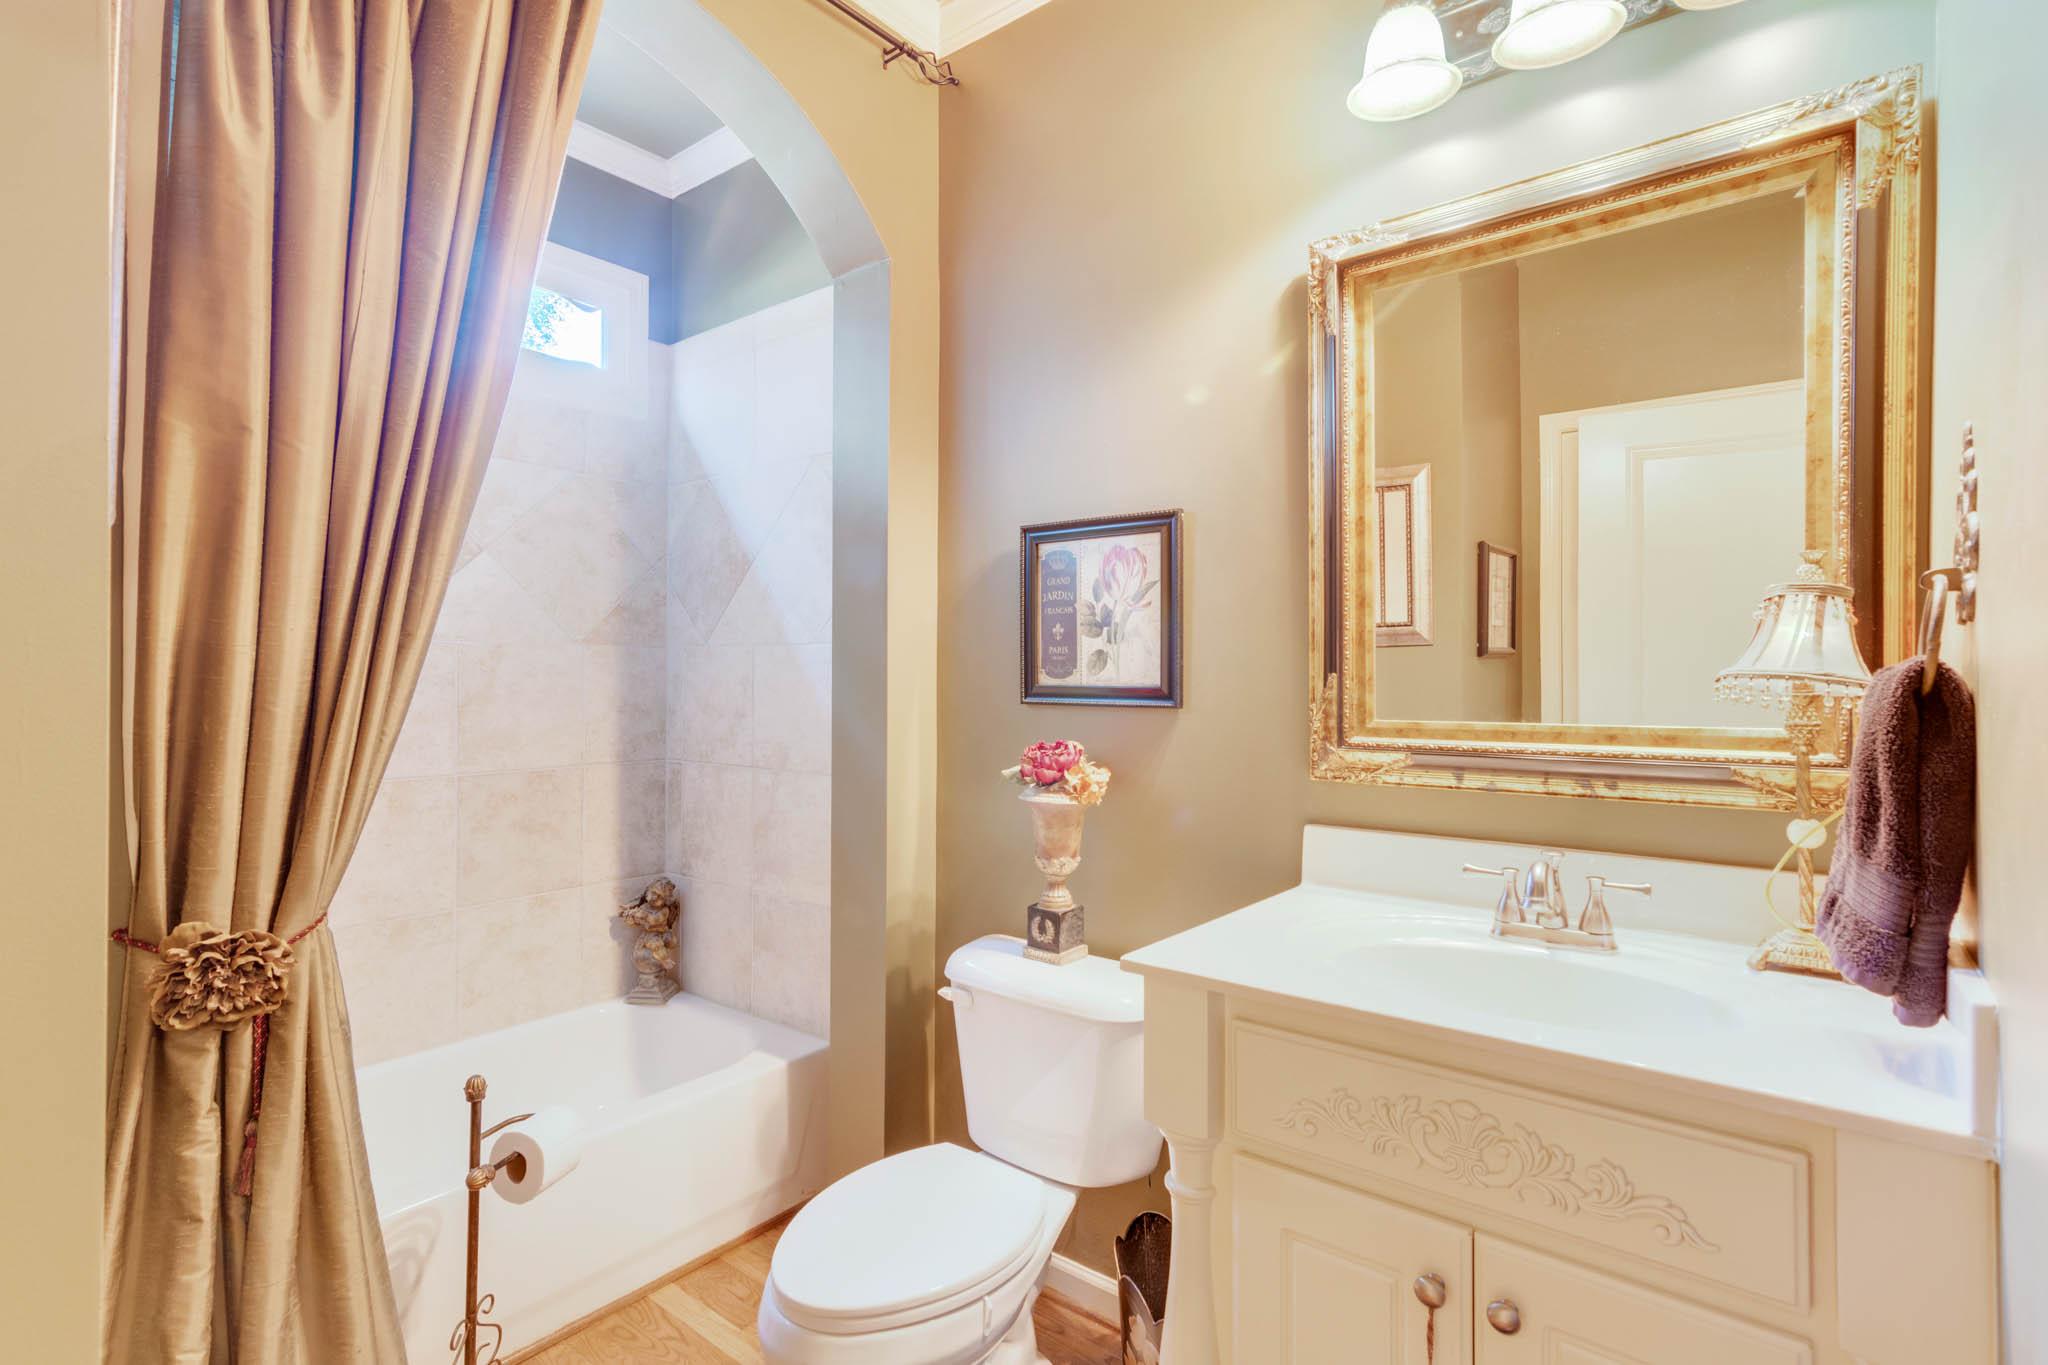 real_estate_photographer_bathroom_photography-9.jpg